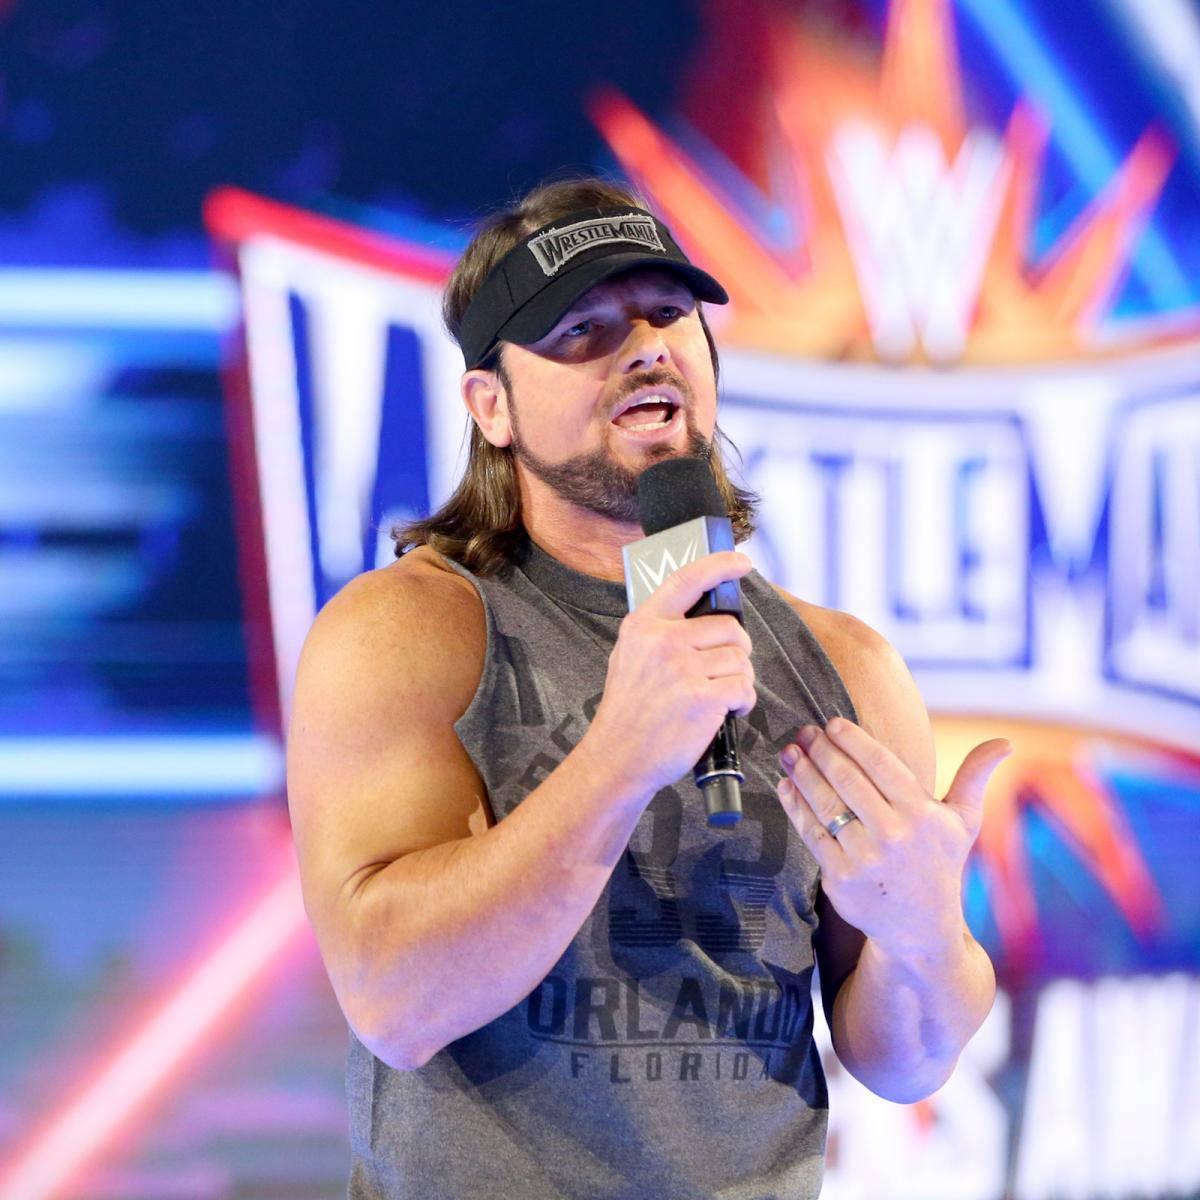 WWE-Smackdown-Live-3-21-17-Shane-McMahon-AJ-Styles-04